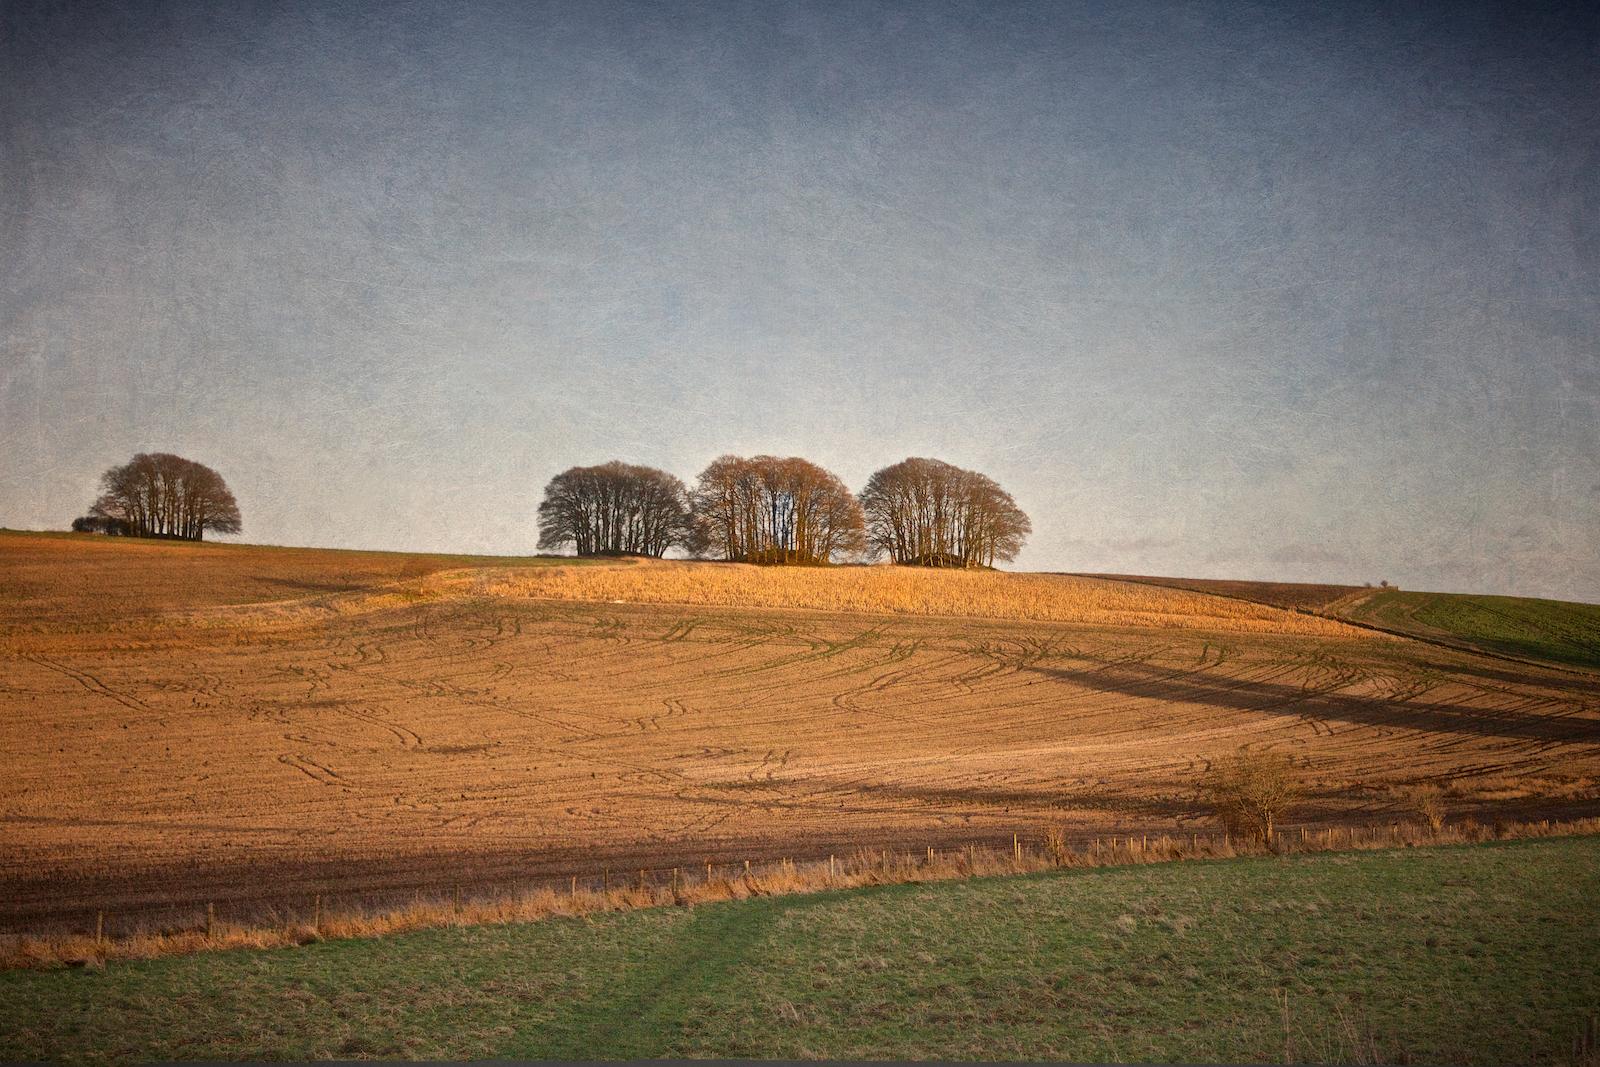 Barrows on Overton Hill, Avebury Circle, Wiltshire, Great Britain